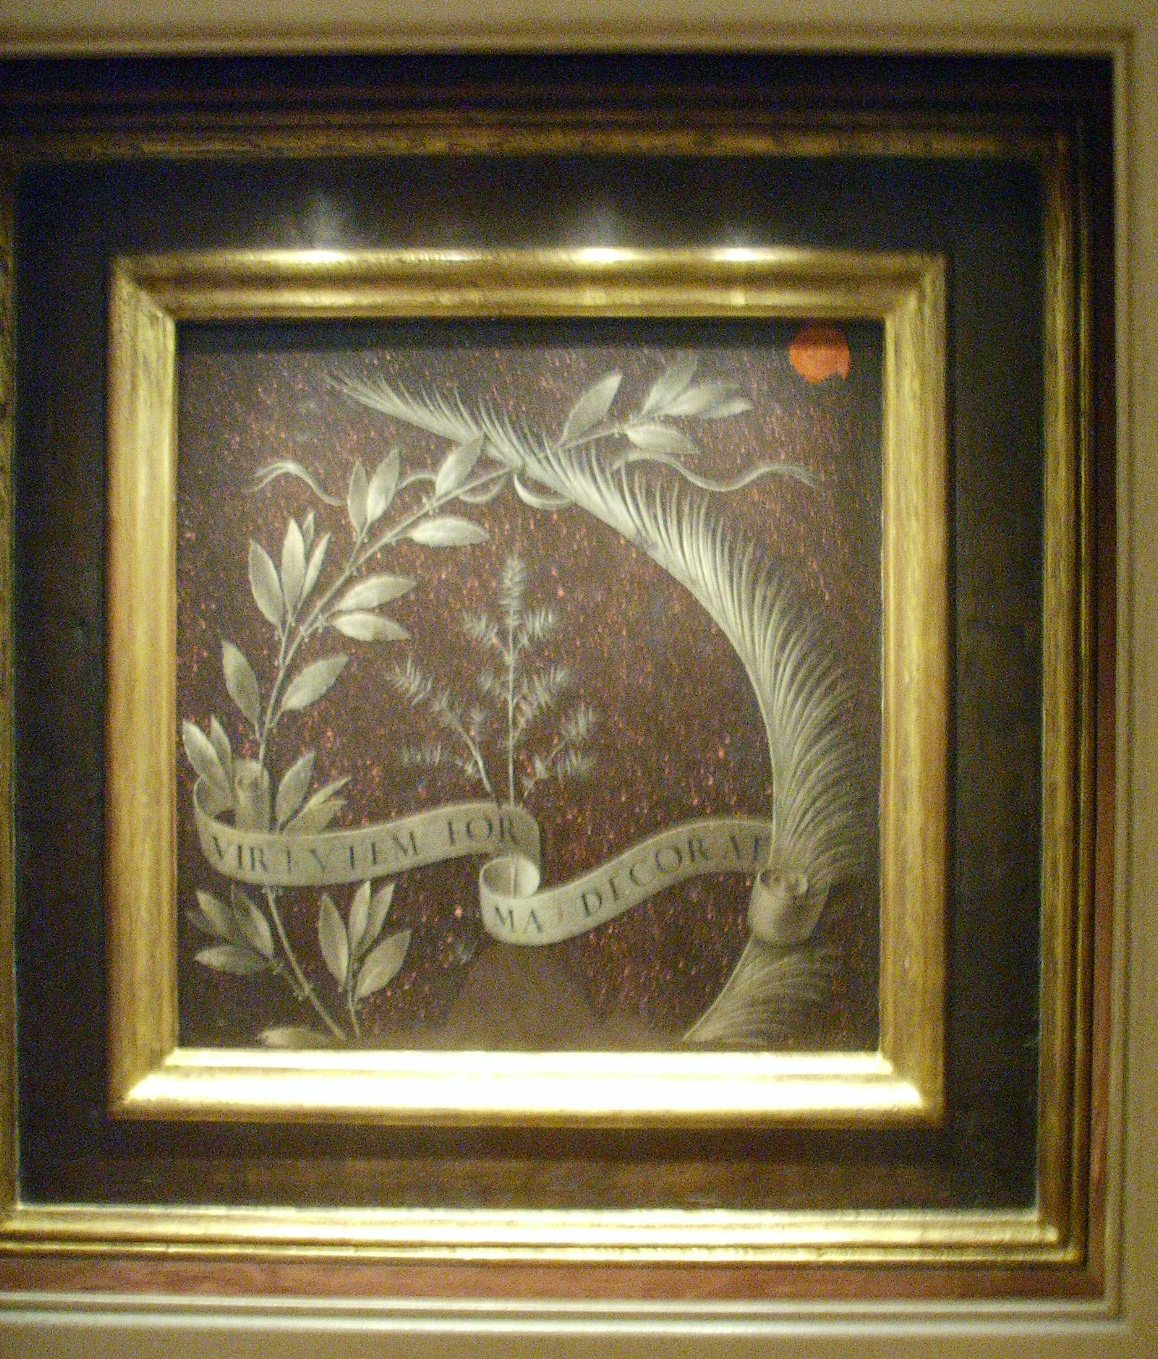 File:National gallery in washington d.c., leonardo da ... Da Vinci Paintings